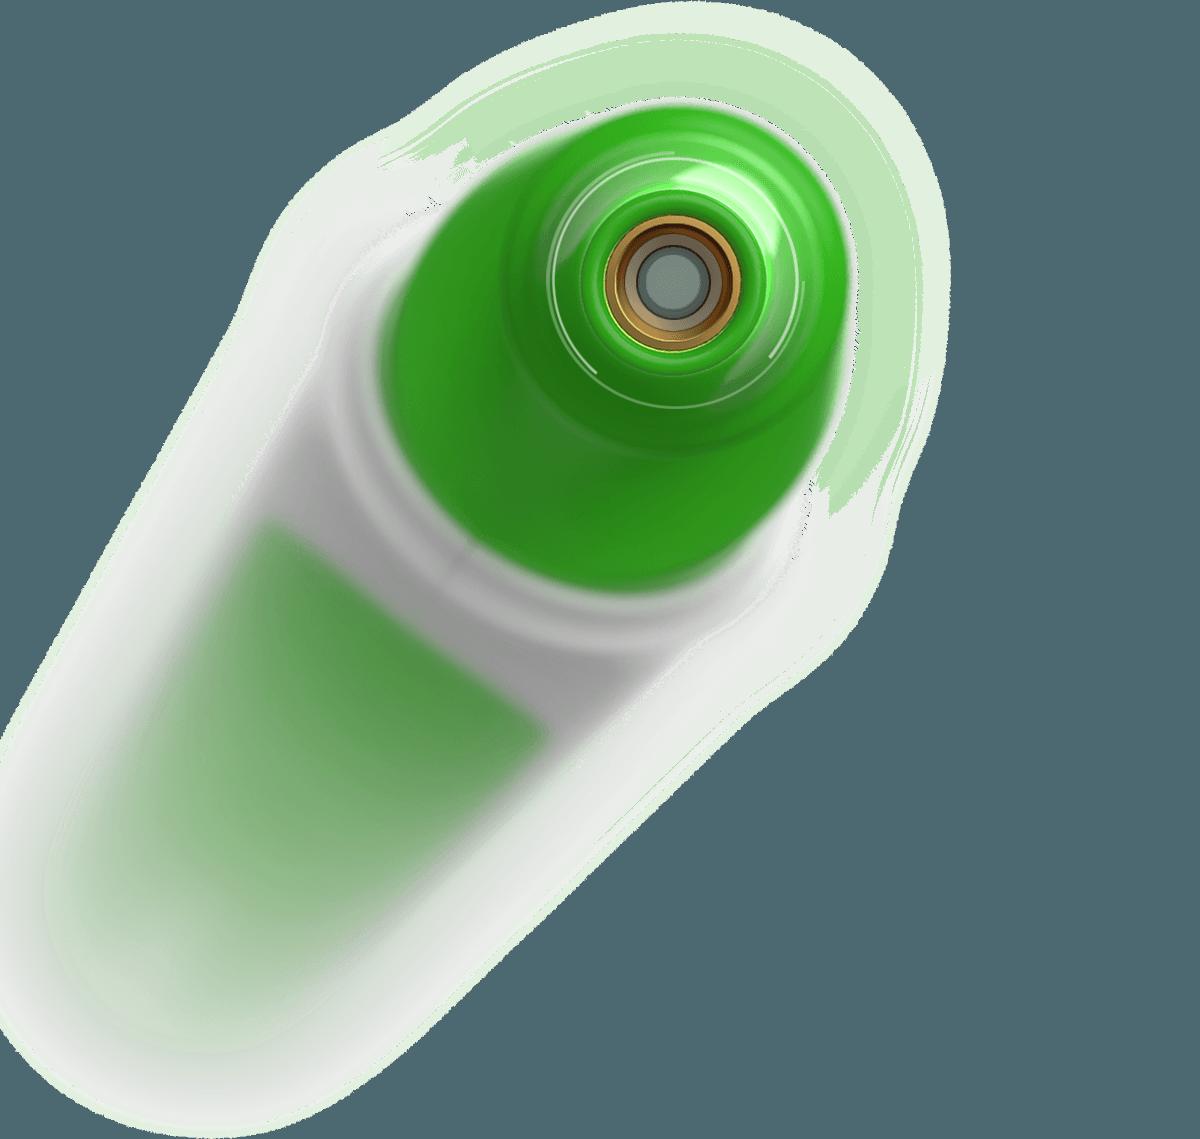 smart thermometer Scientific and Accurate